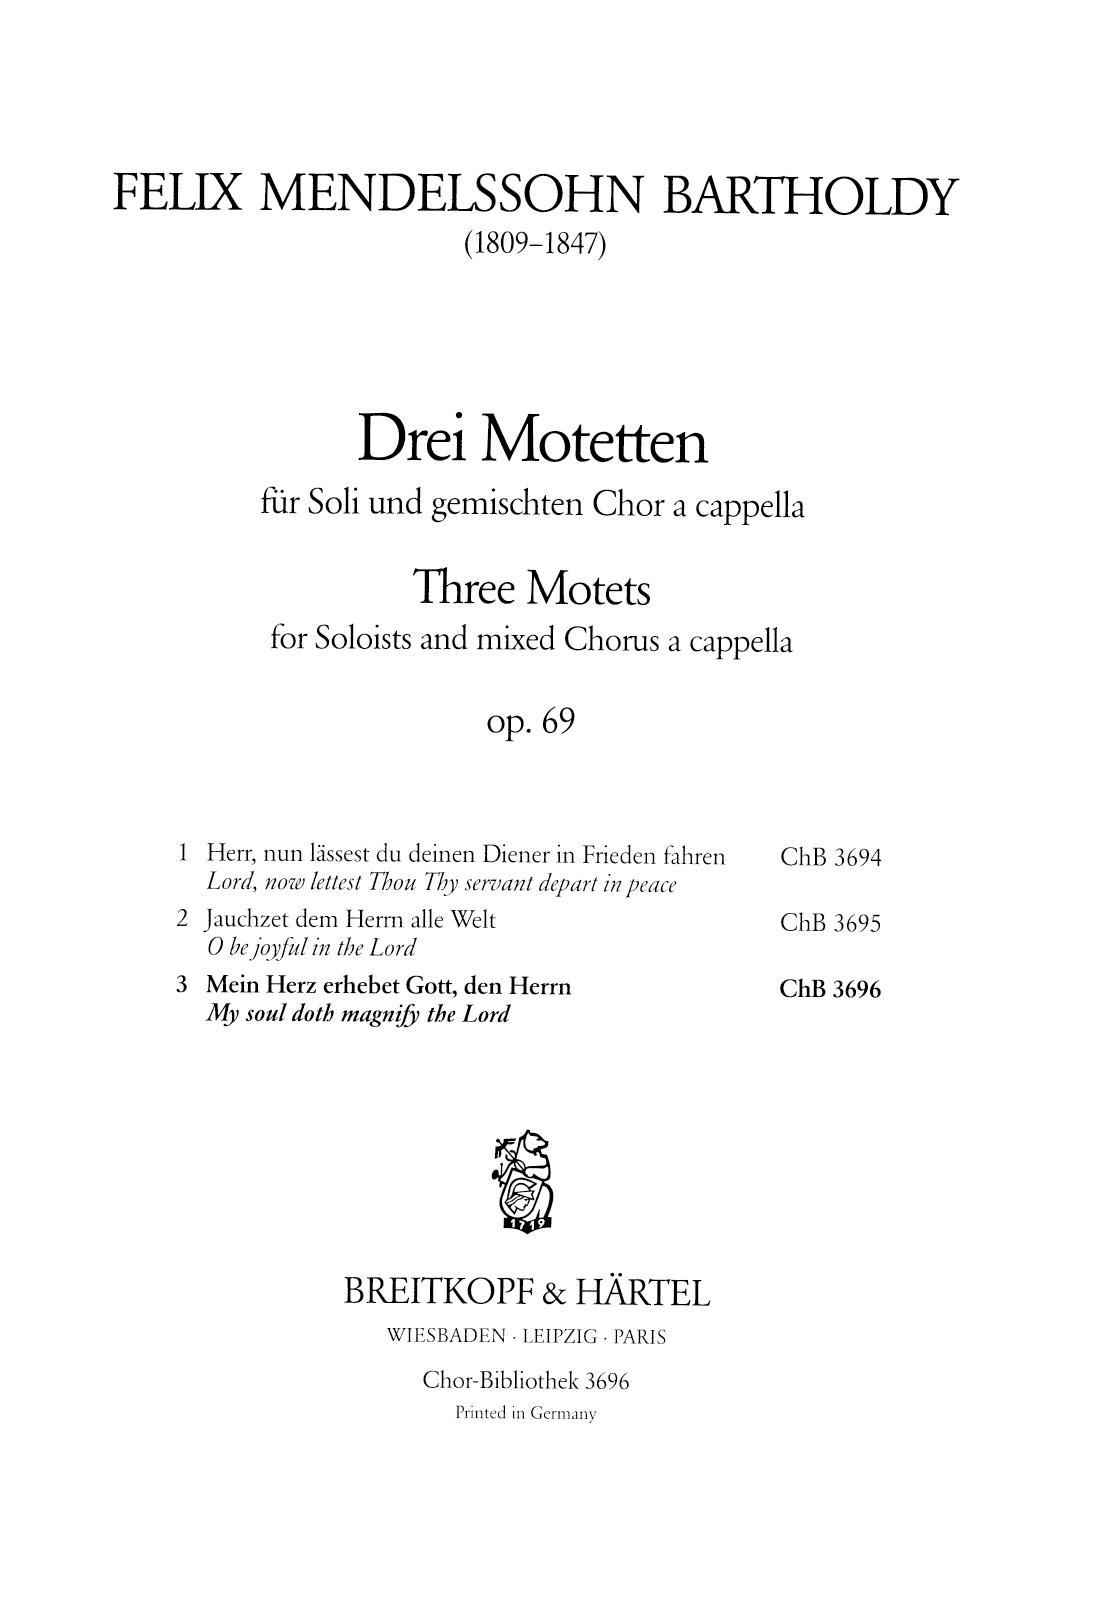 3 Motets Op. 69